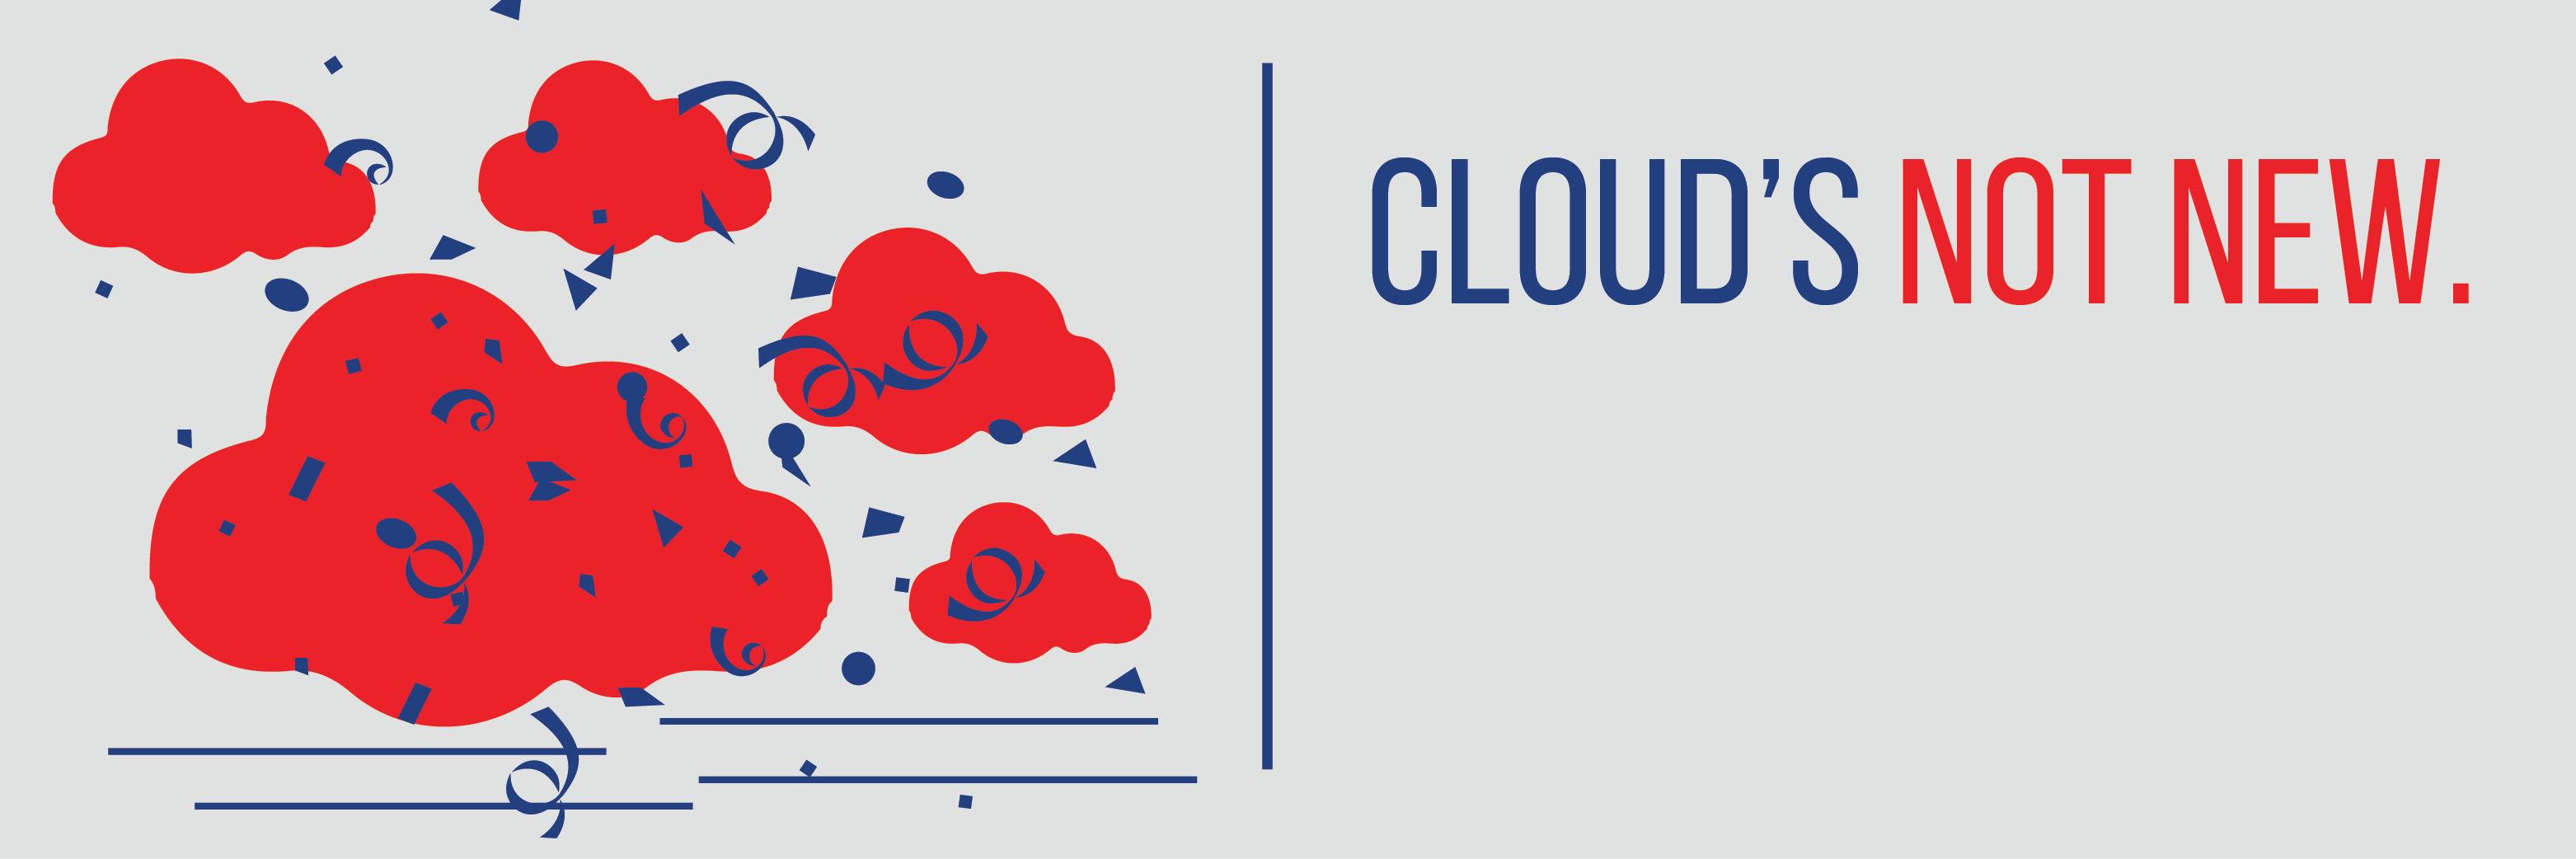 Cloud's not new